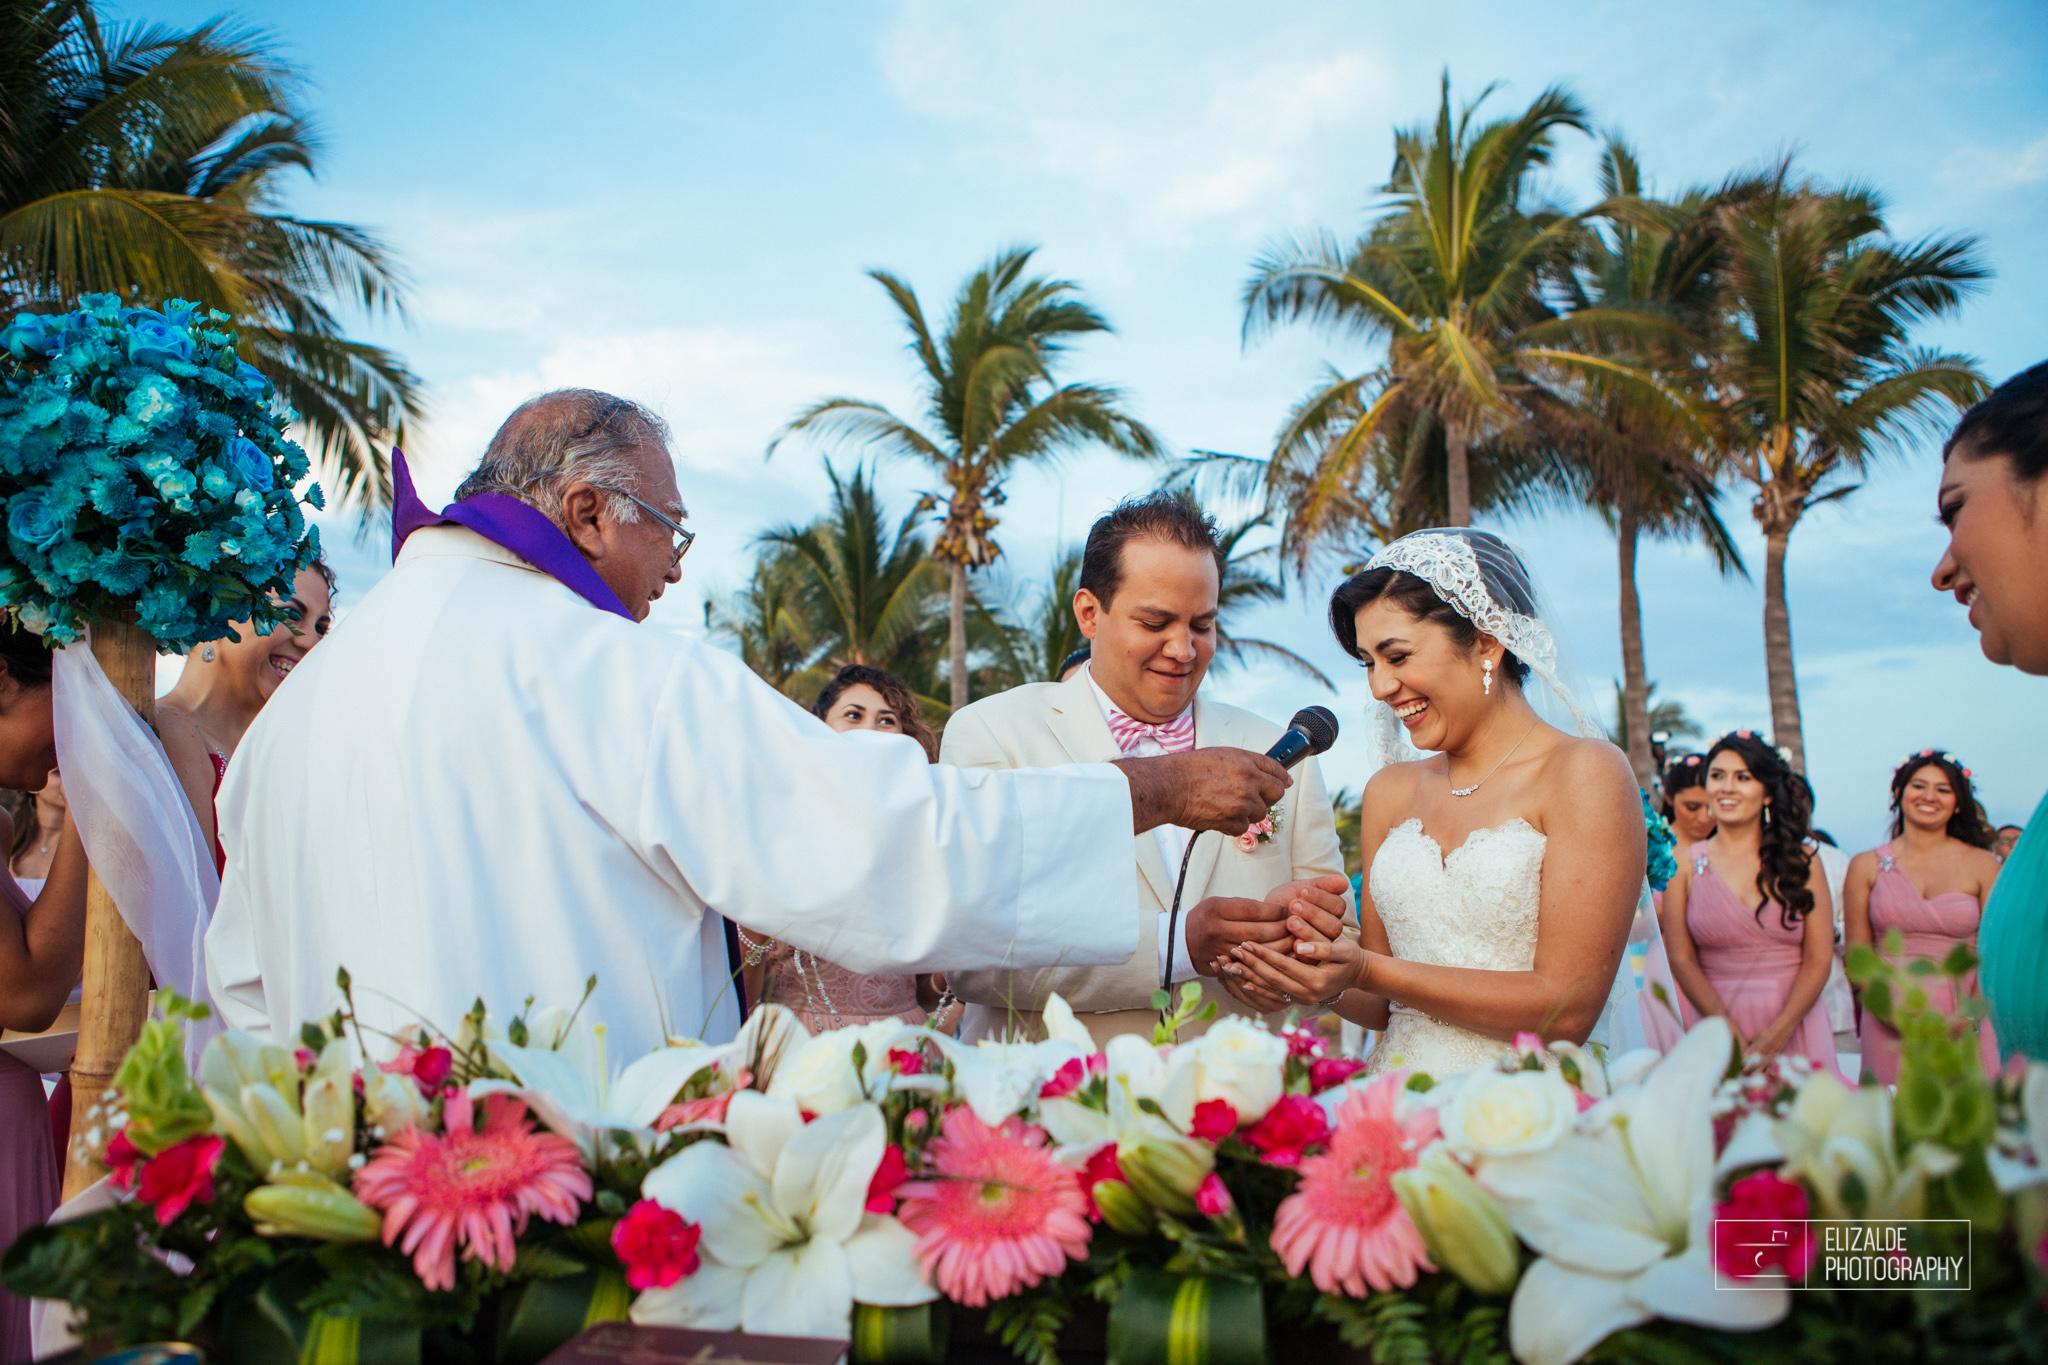 Pay and Ferran_Acapulco_Destination Wedding_Elizalde Photography-98.jpg